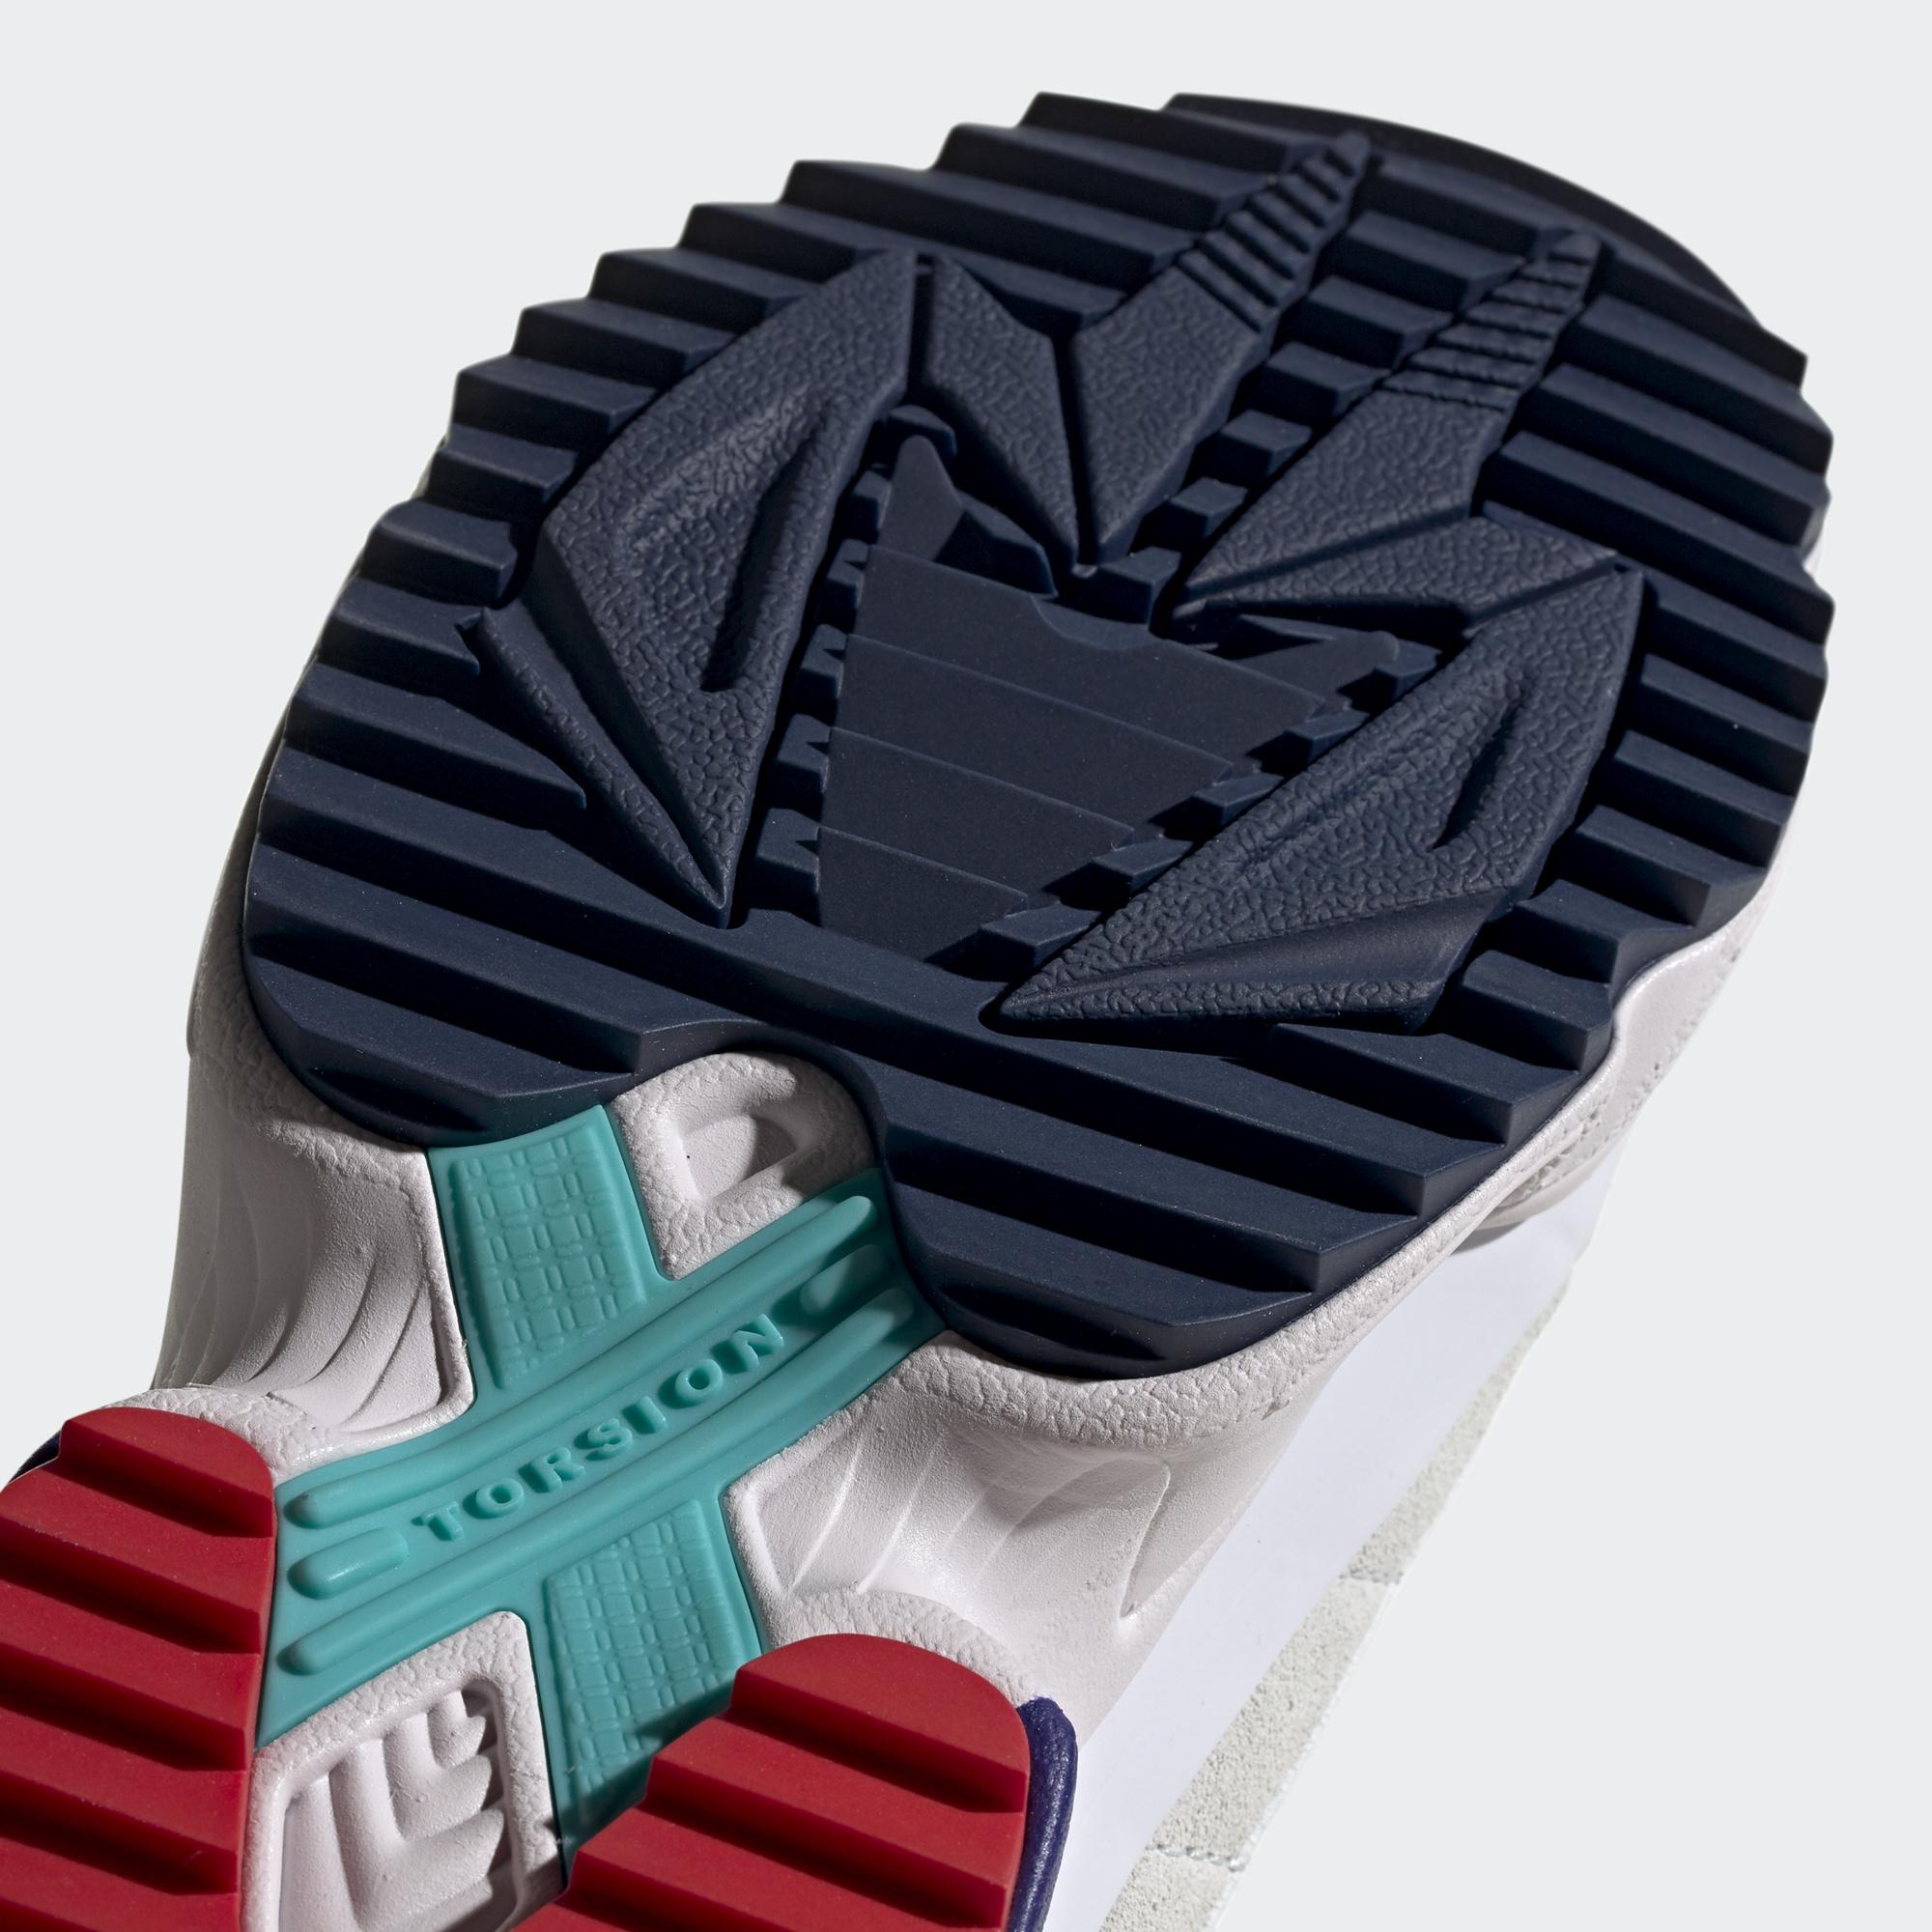 Adidas Kiellor W  Crywht/Crywht/Orctin - laatste paar: maat 39 1/3